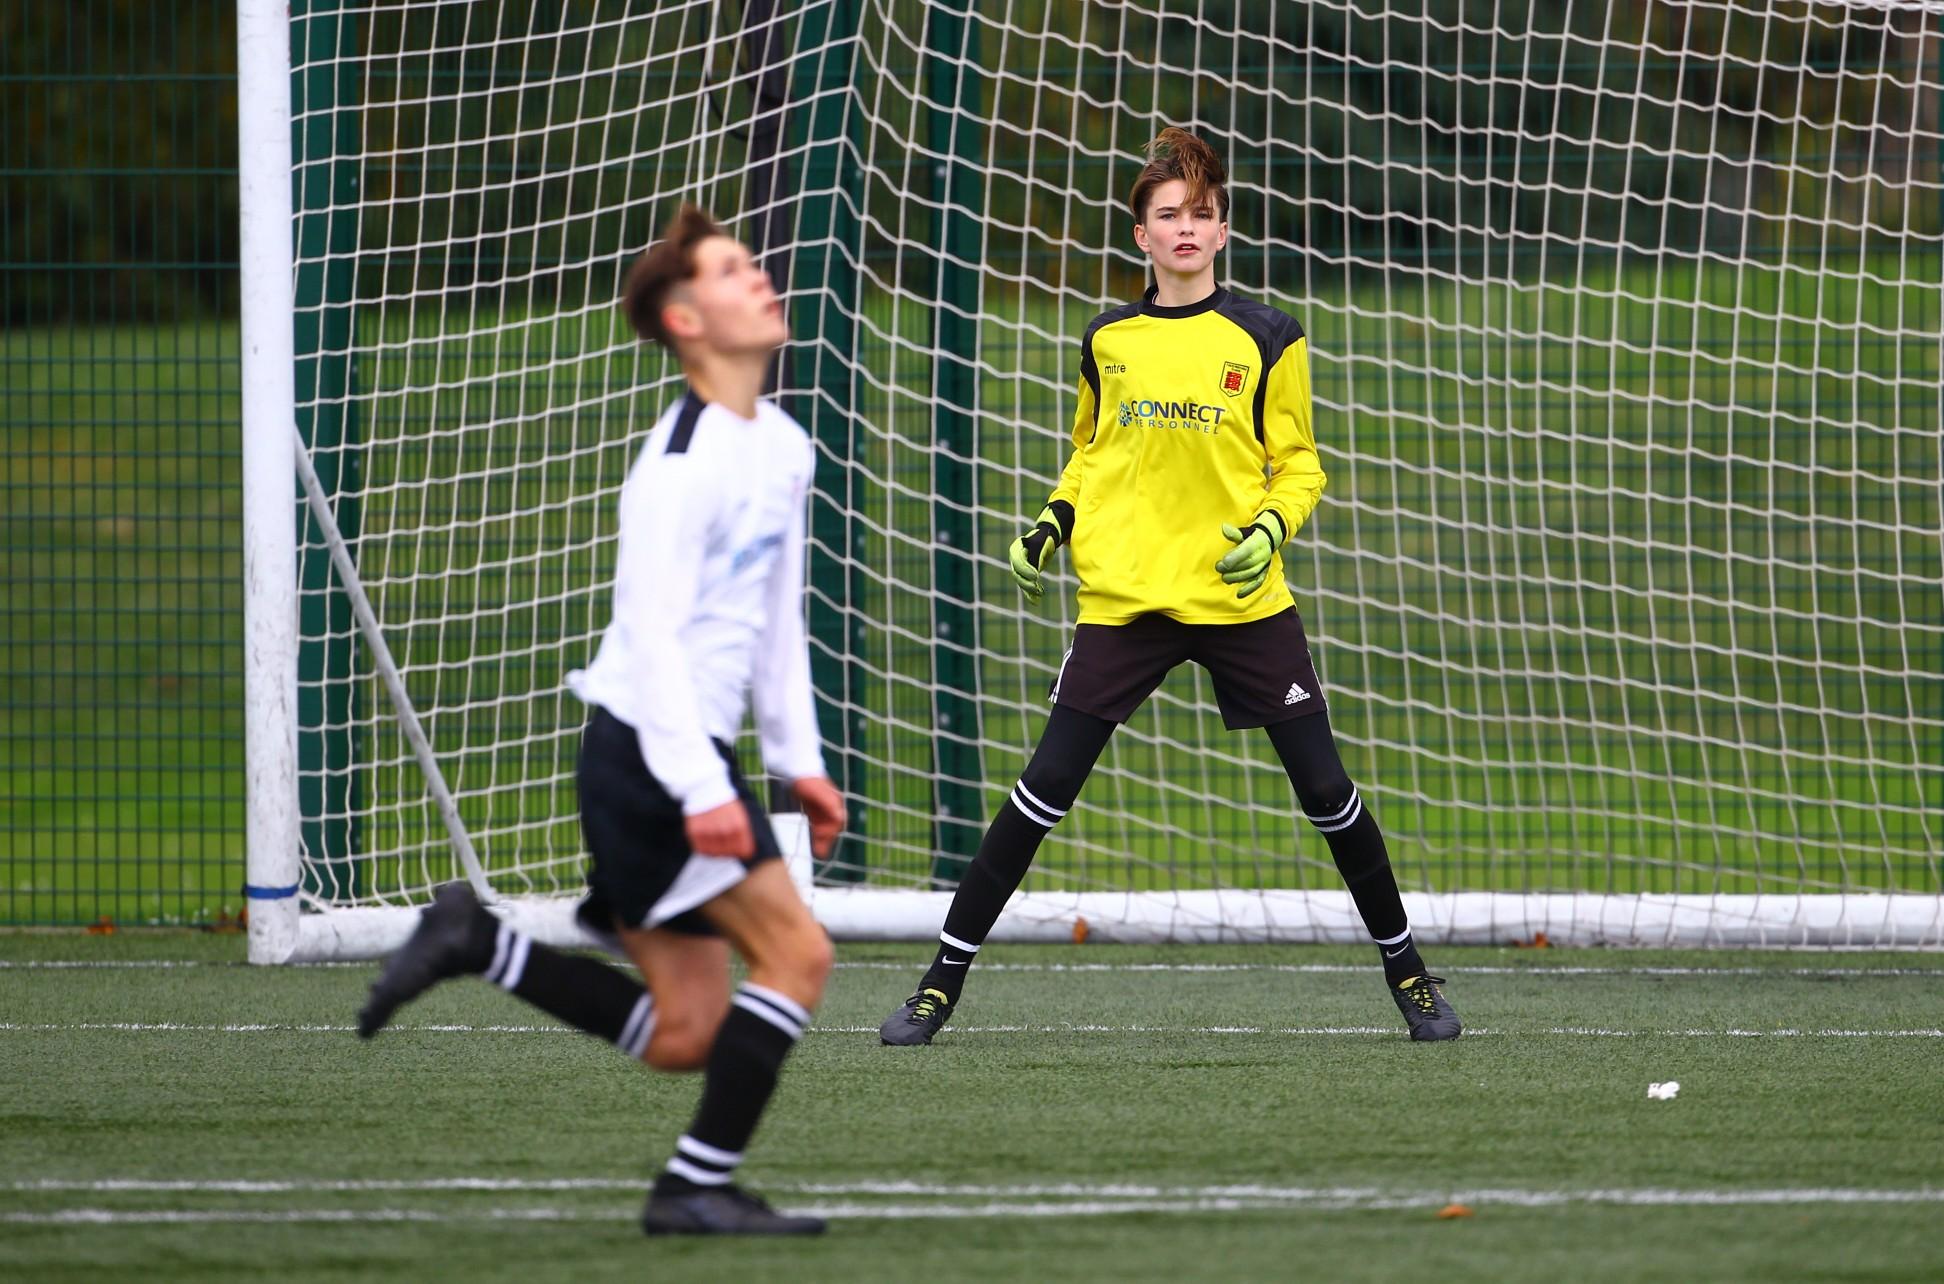 Faversham Town U16S vs Deal Town U16s